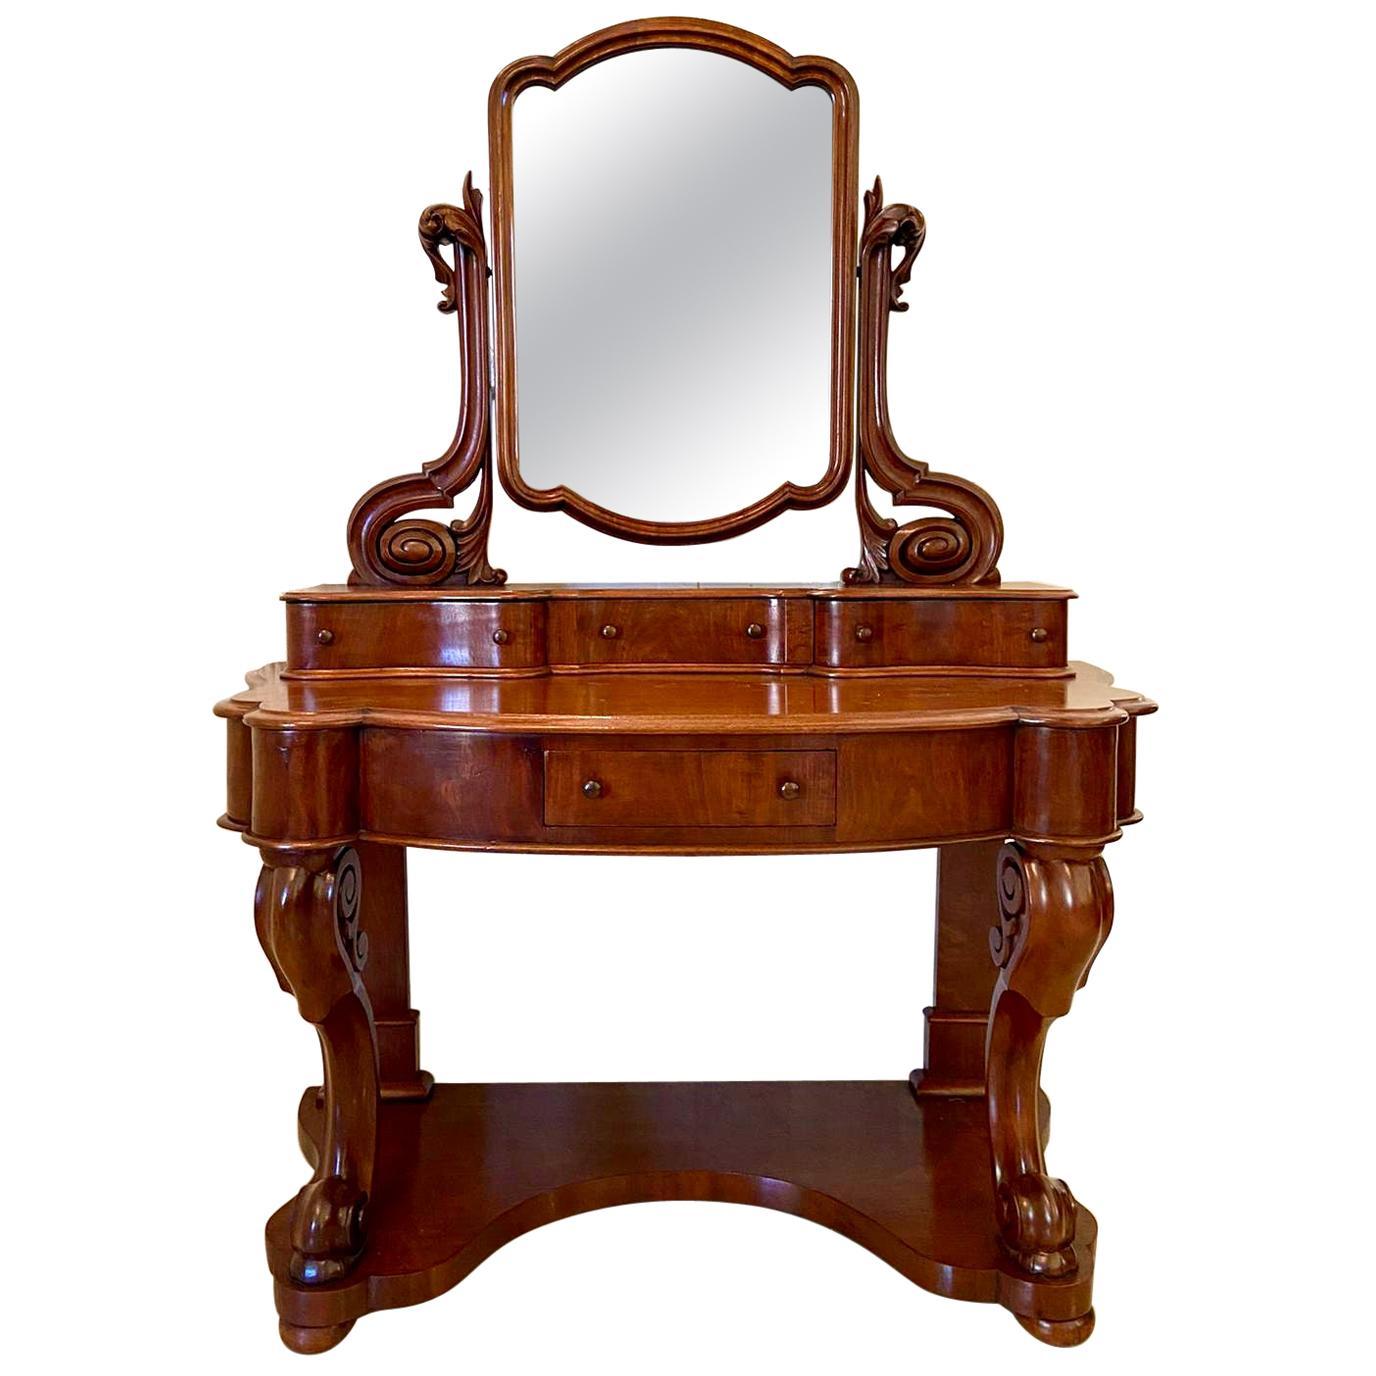 19th Century Antique Victorian Mahogany Vanity/Dressing Table